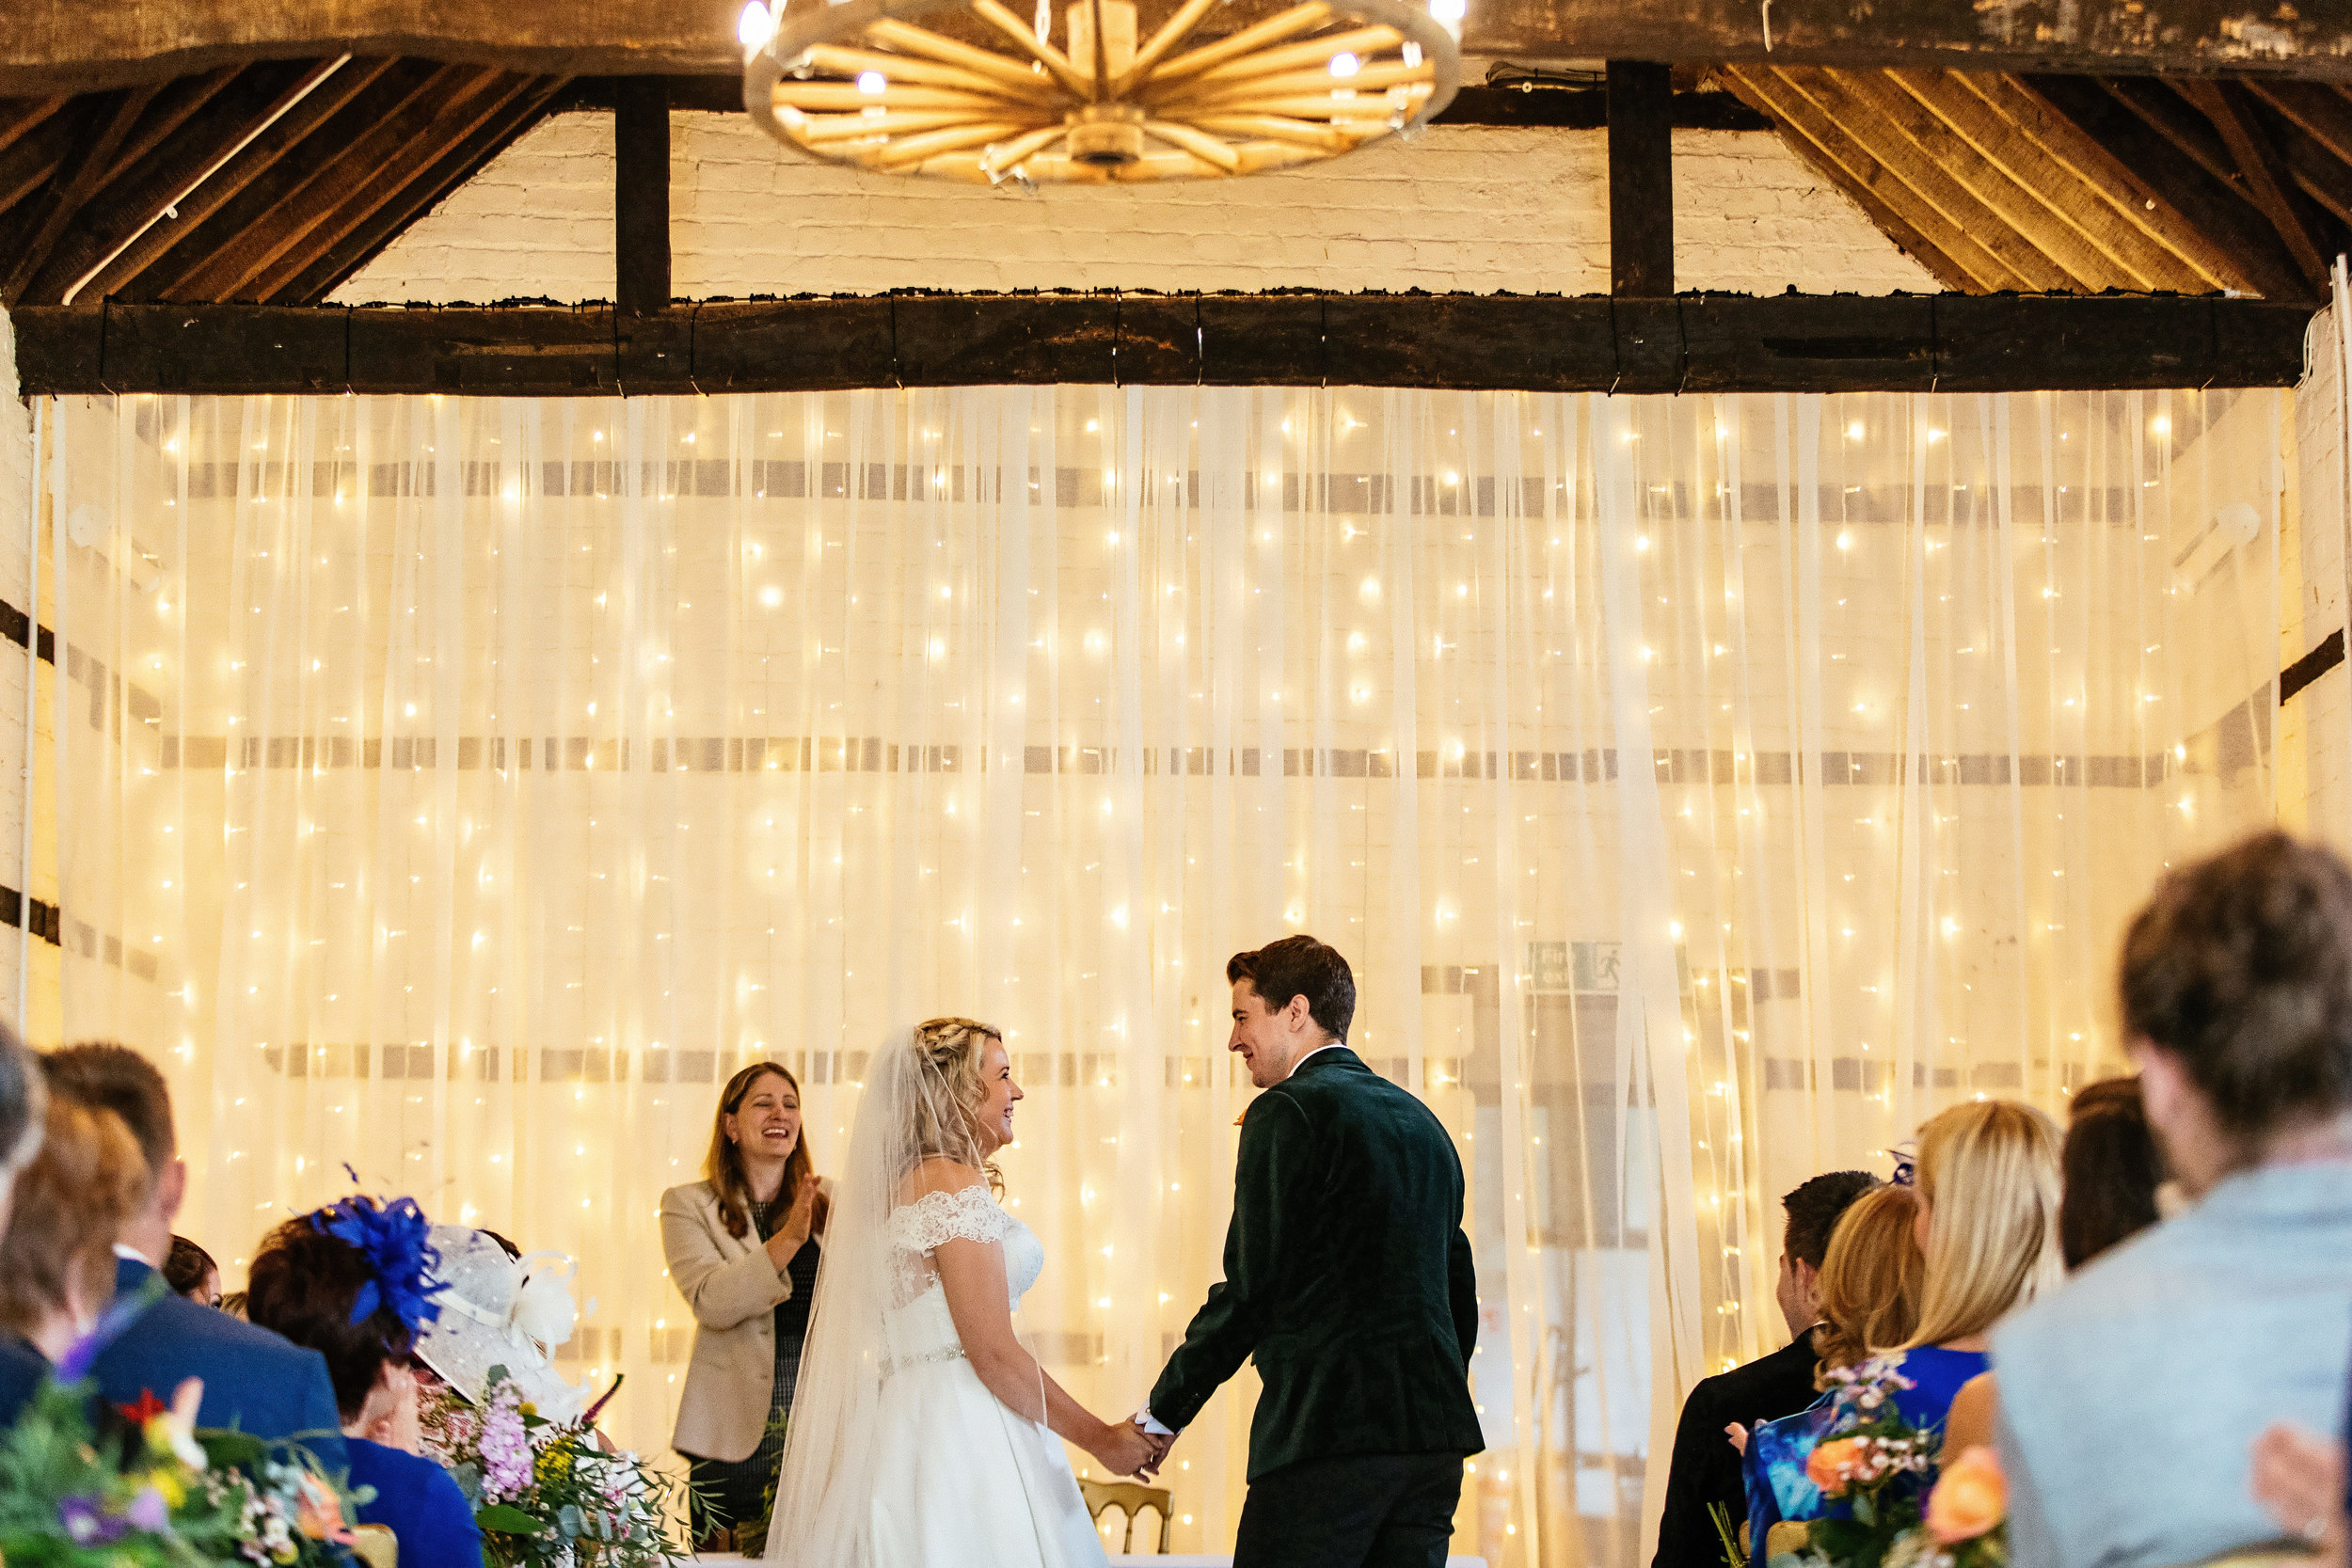 Tamara-and-Richard-Wedding-Highlights-28.jpg